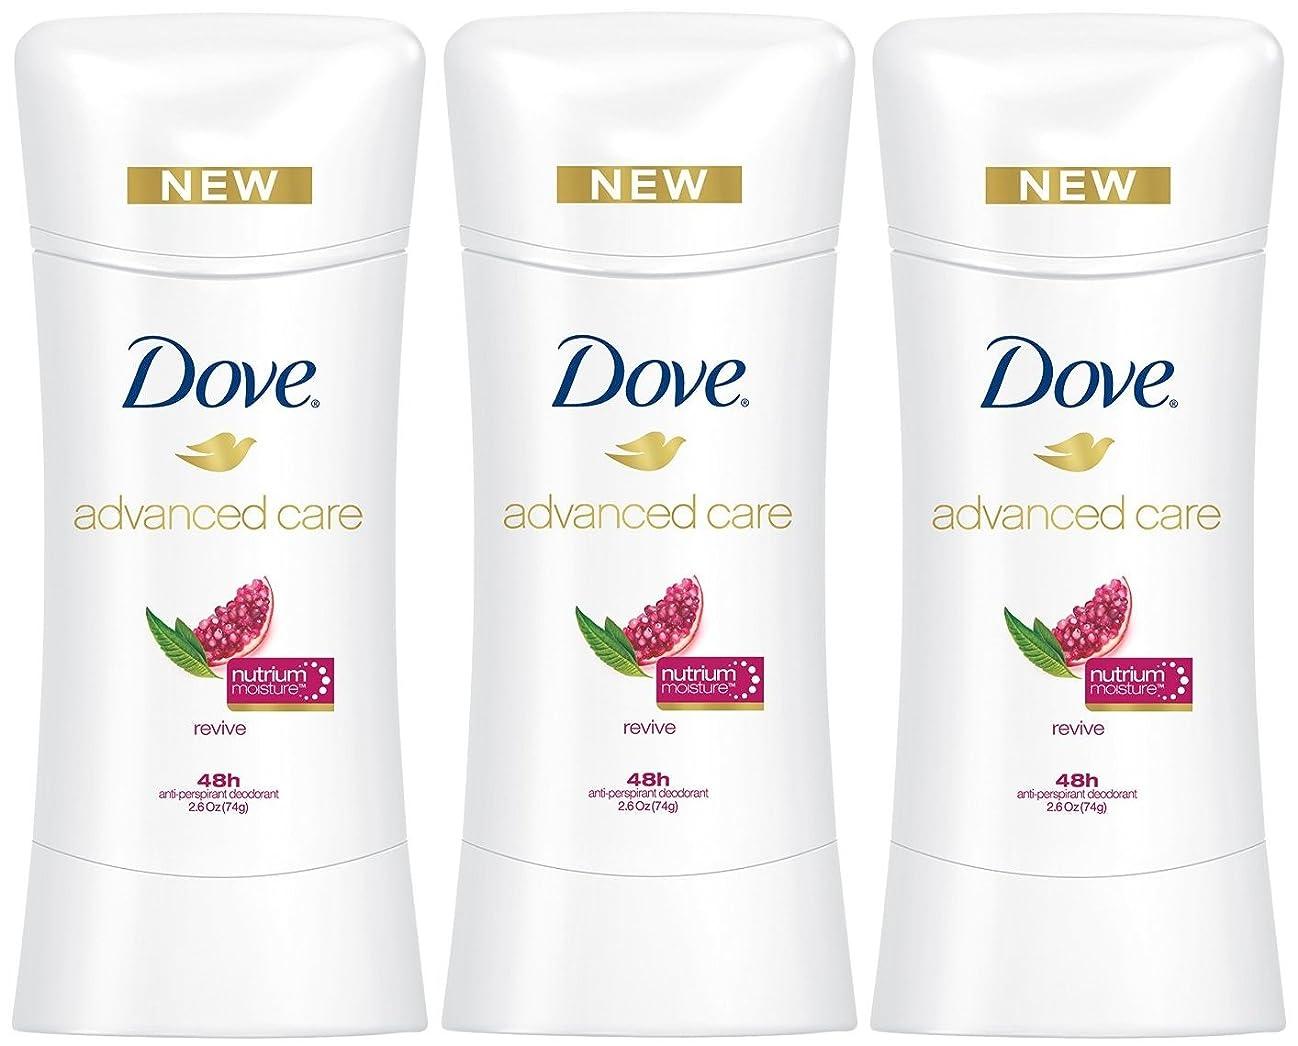 Dove Advanced Care Anti-Perspirant Deodorant, Revive 2.6 Oz?(Pack of 3) afnfv728008